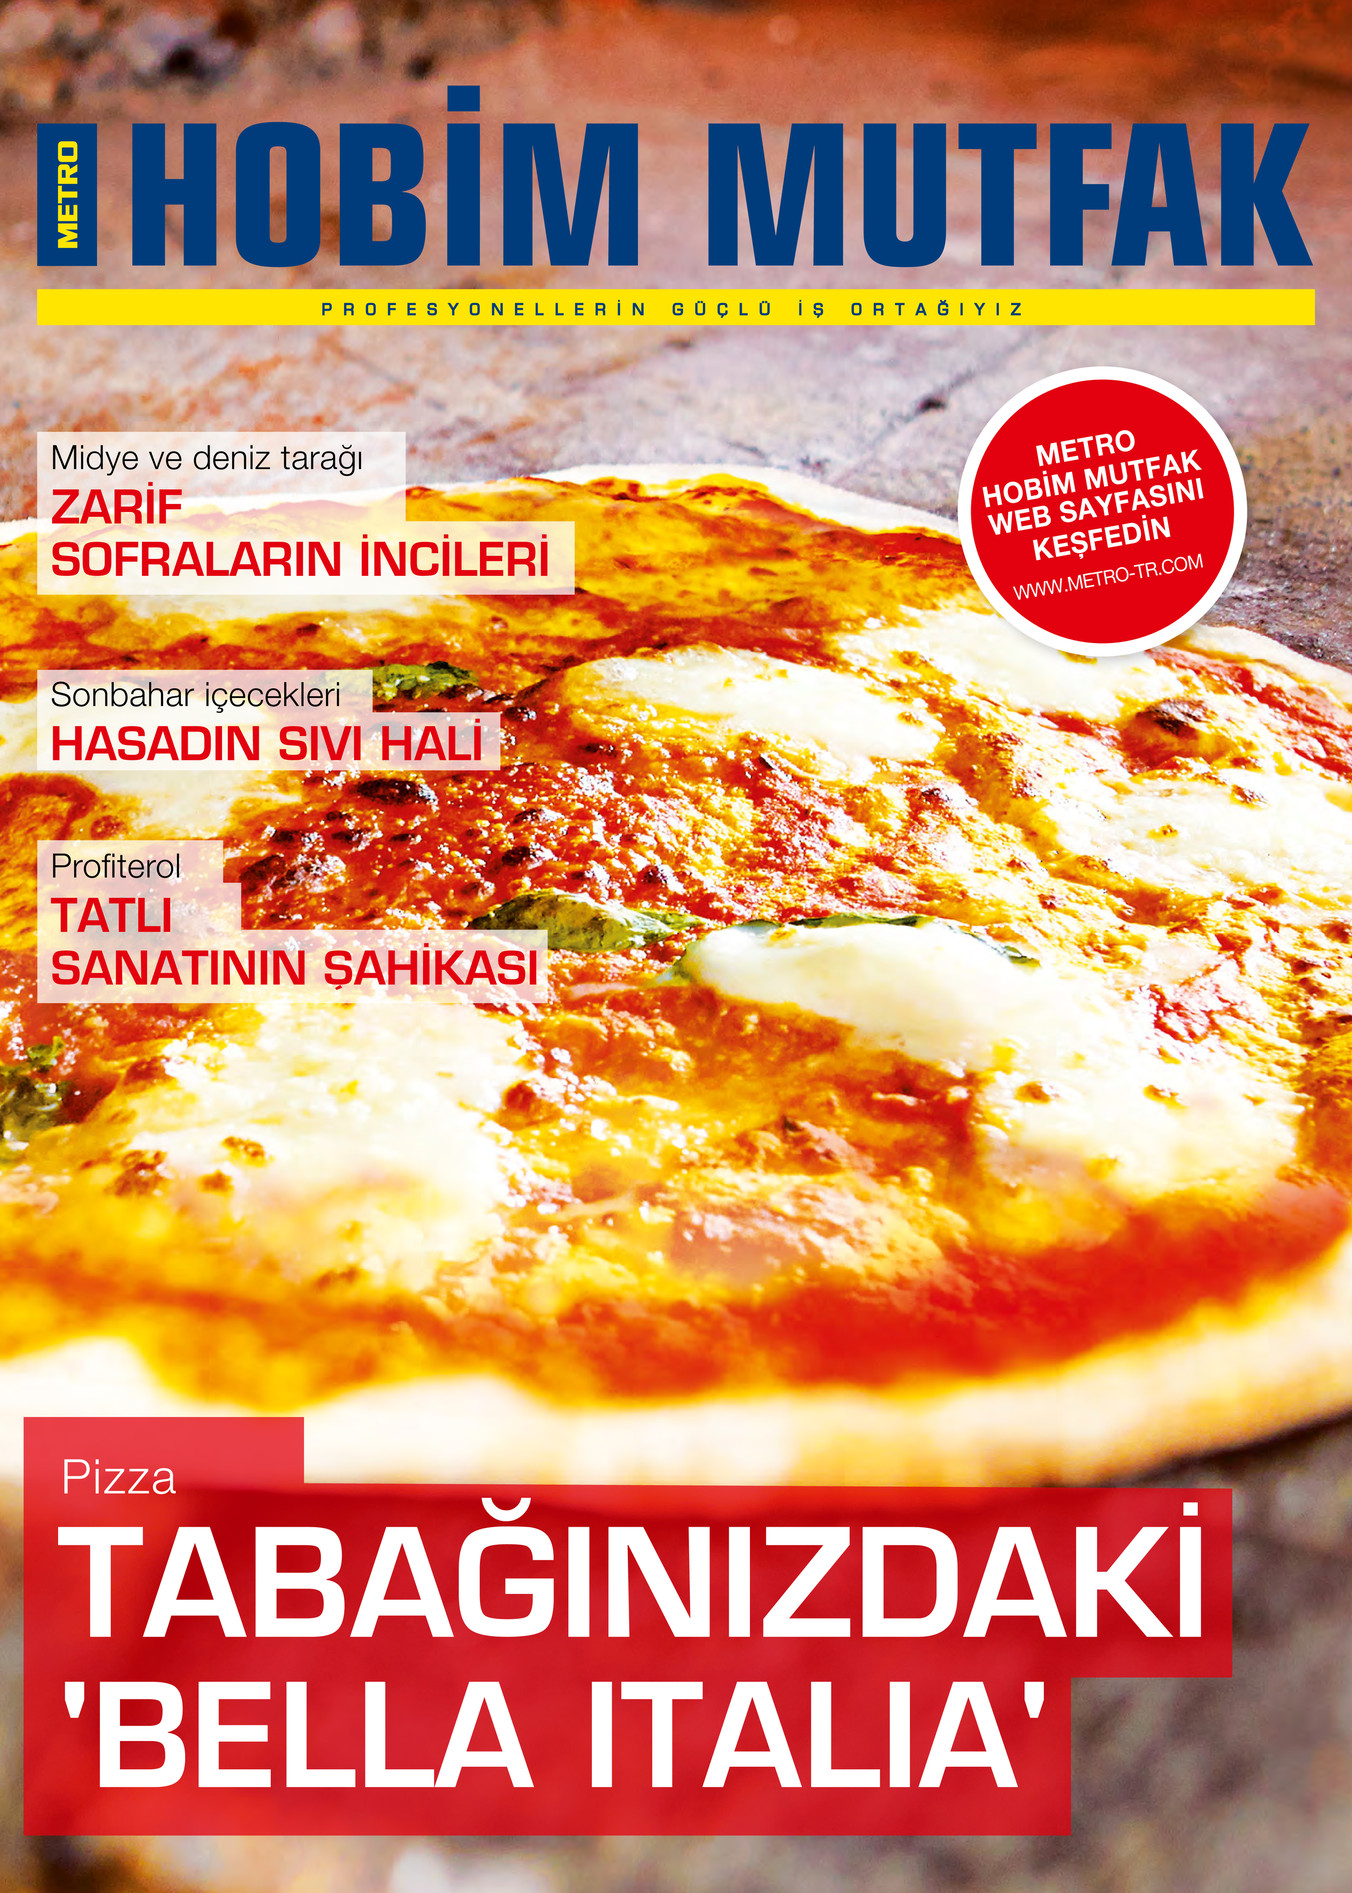 Metro Kataloglar - Hobim Mutfak 7 - Sayfa 2-3